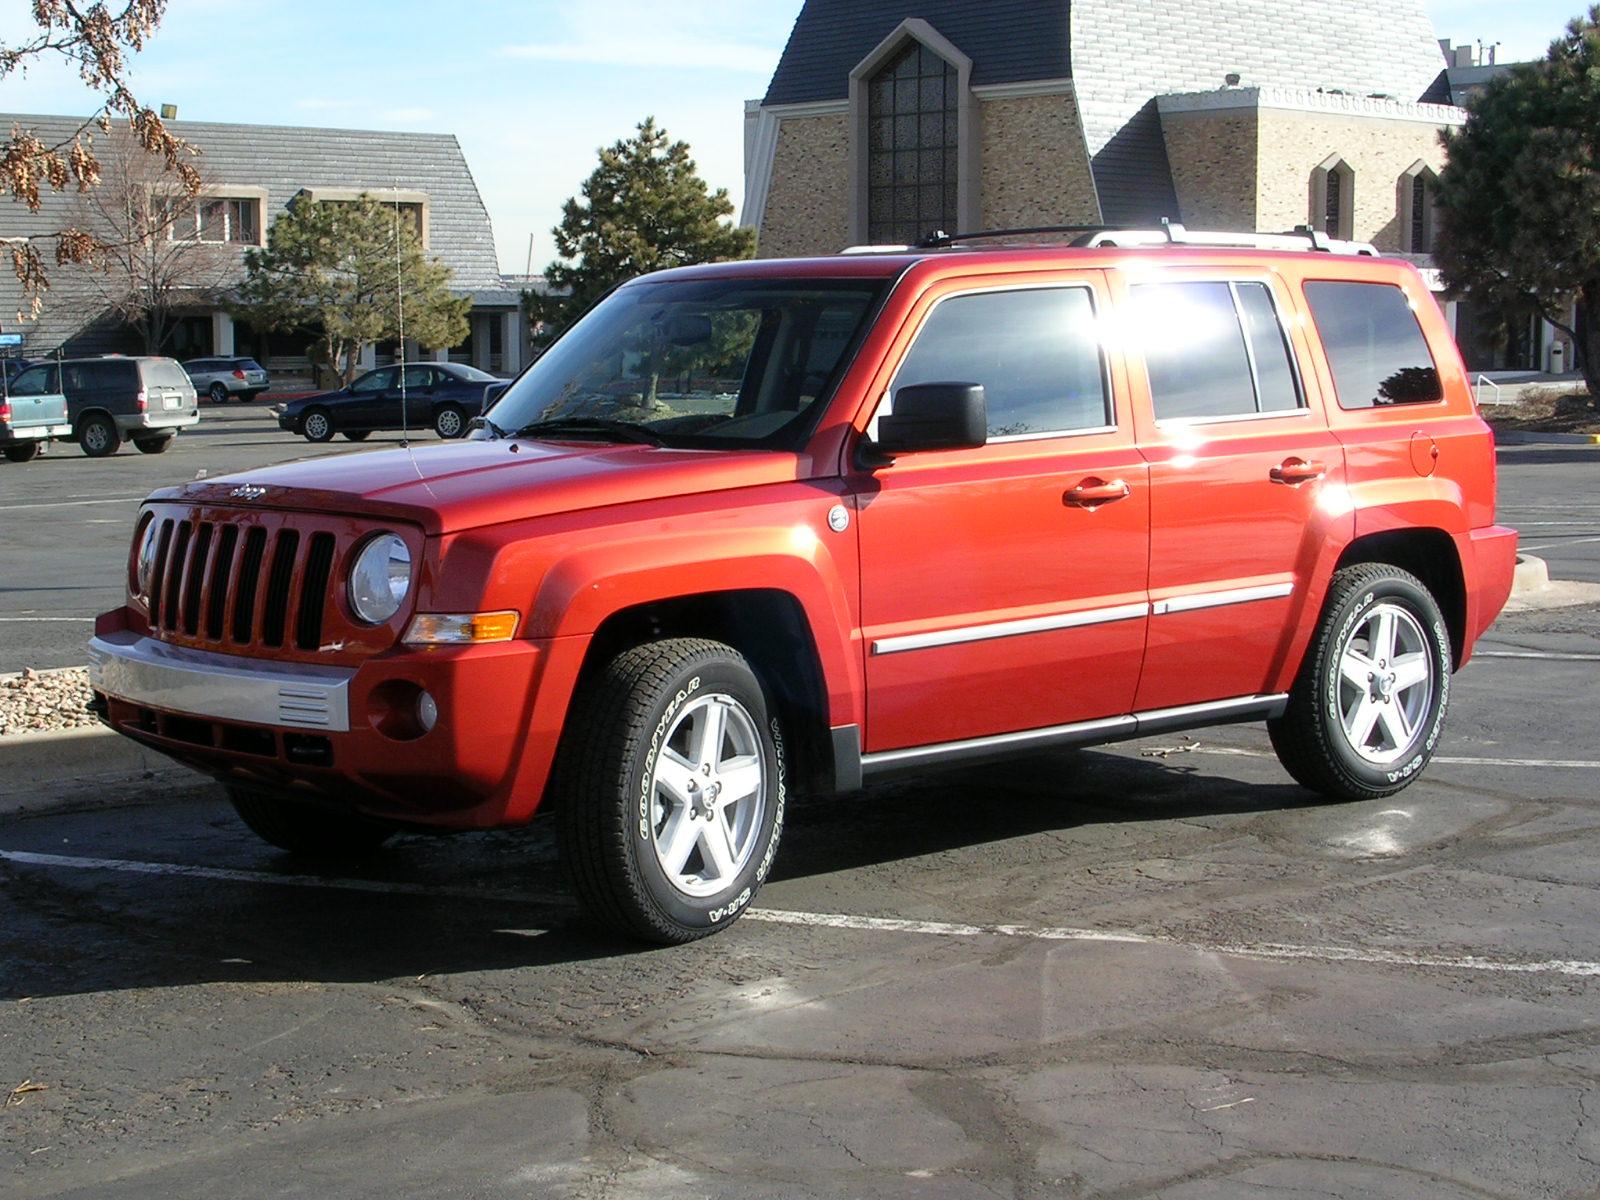 2010 Jeep Patriot: a true off-road vehicle, fuel effecient and ...